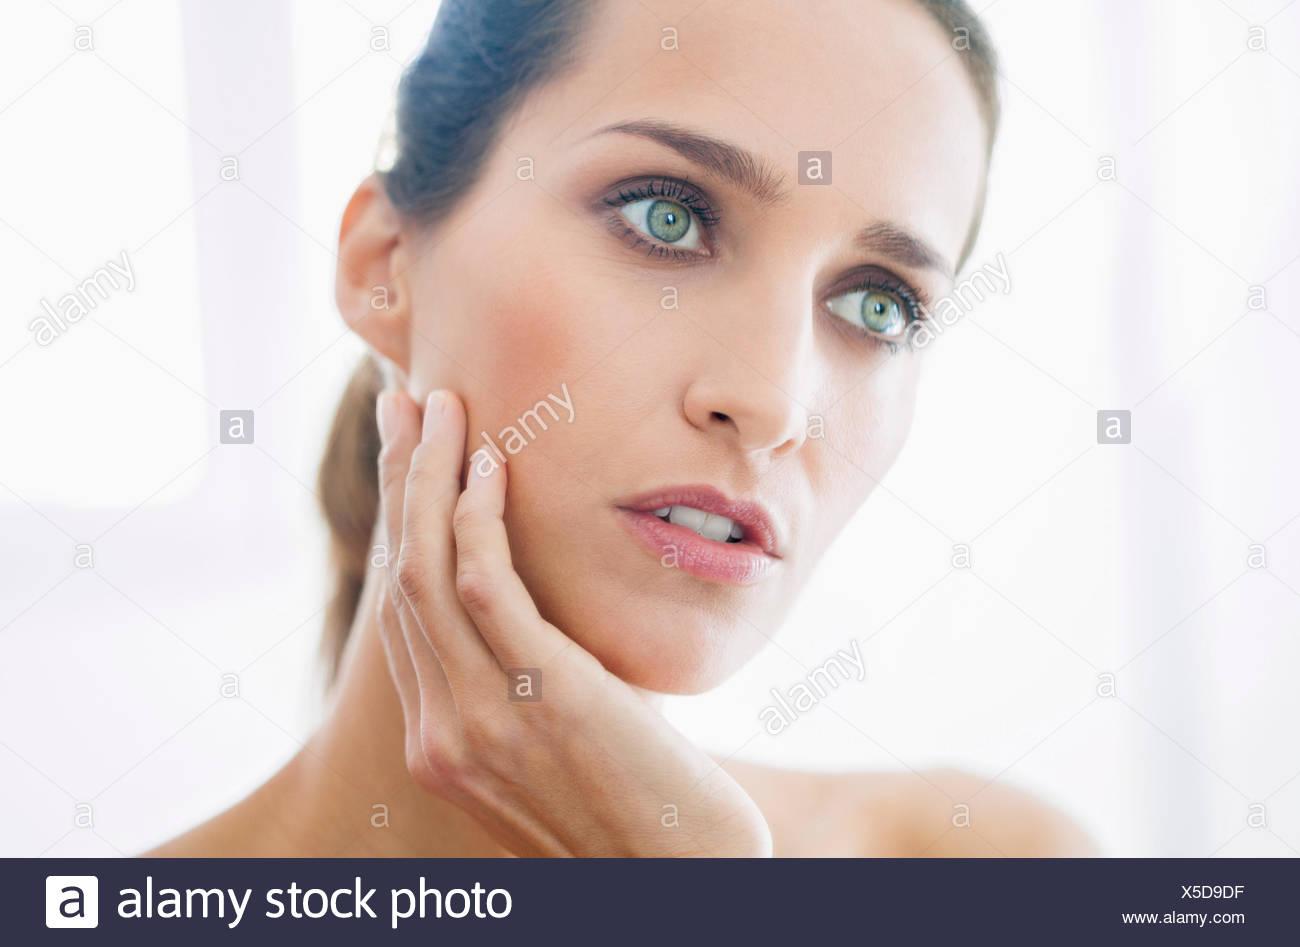 Close-up of a beautiful woman looking away Stock Photo